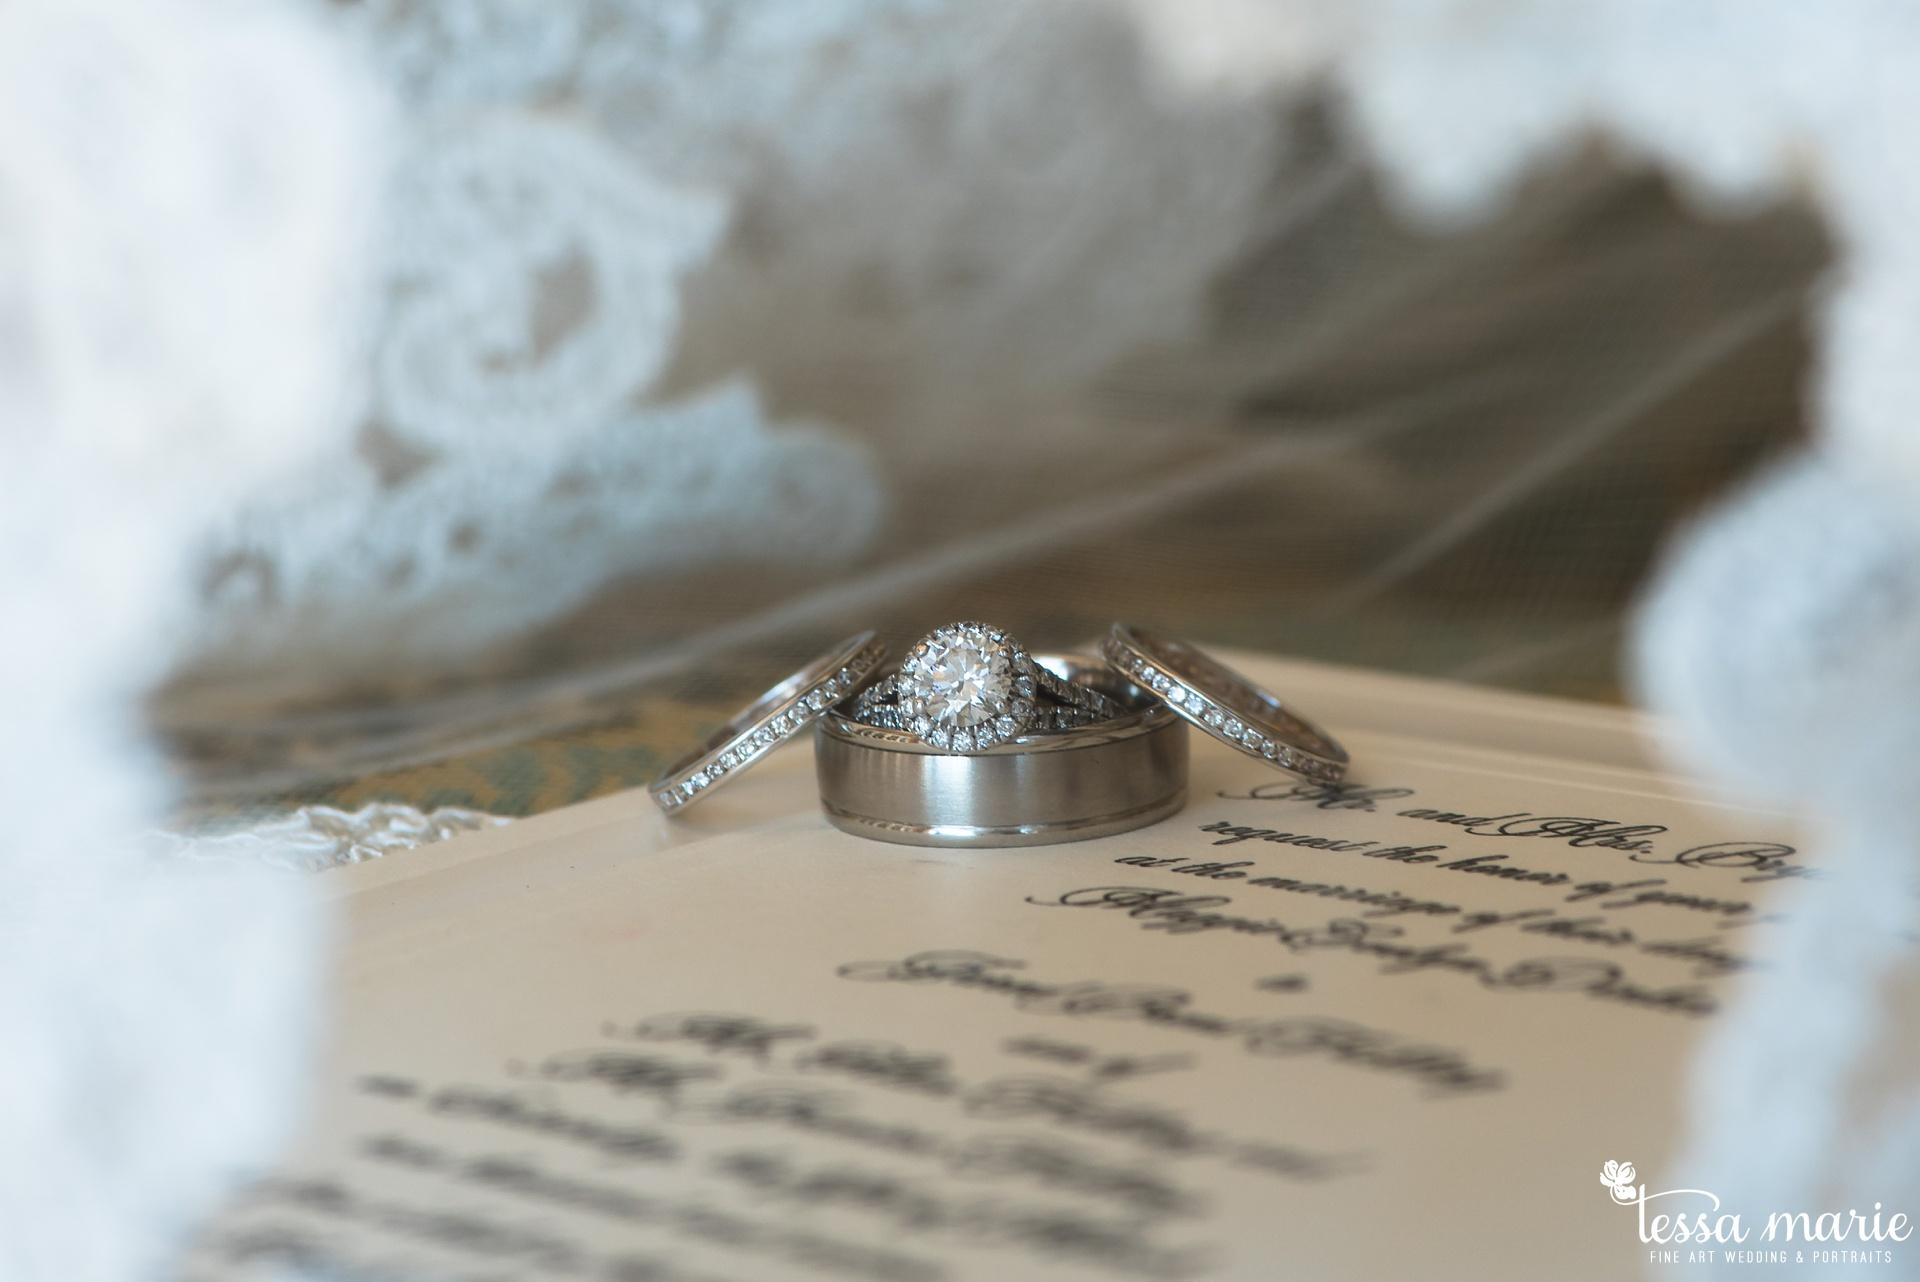 tessa_marie_legacy_moments_storytelling_candid_emotionally_driven_wedding_photographer_atlanta_wedding_photography_st_ives_country_club_wedding_boukates_bridals_by_lori_0032